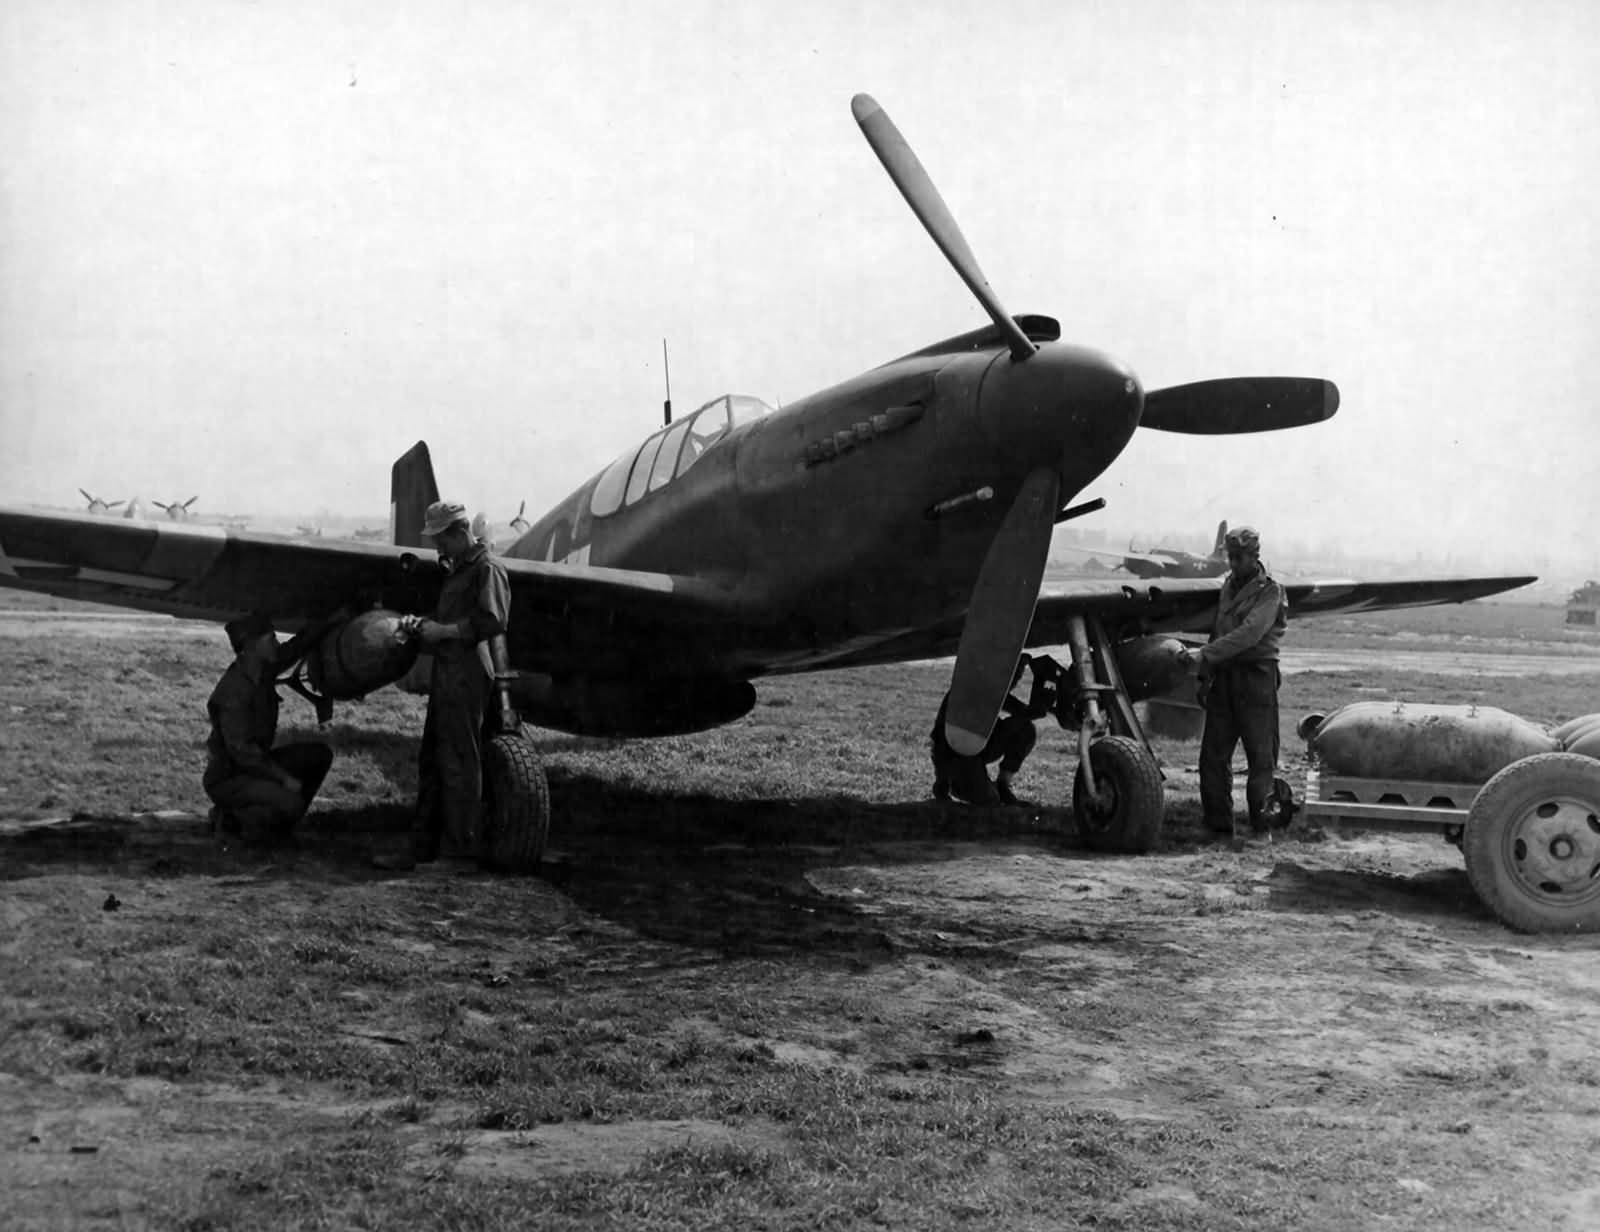 a-36_527th_fbs_86th_fbg_1944_italy.jpg